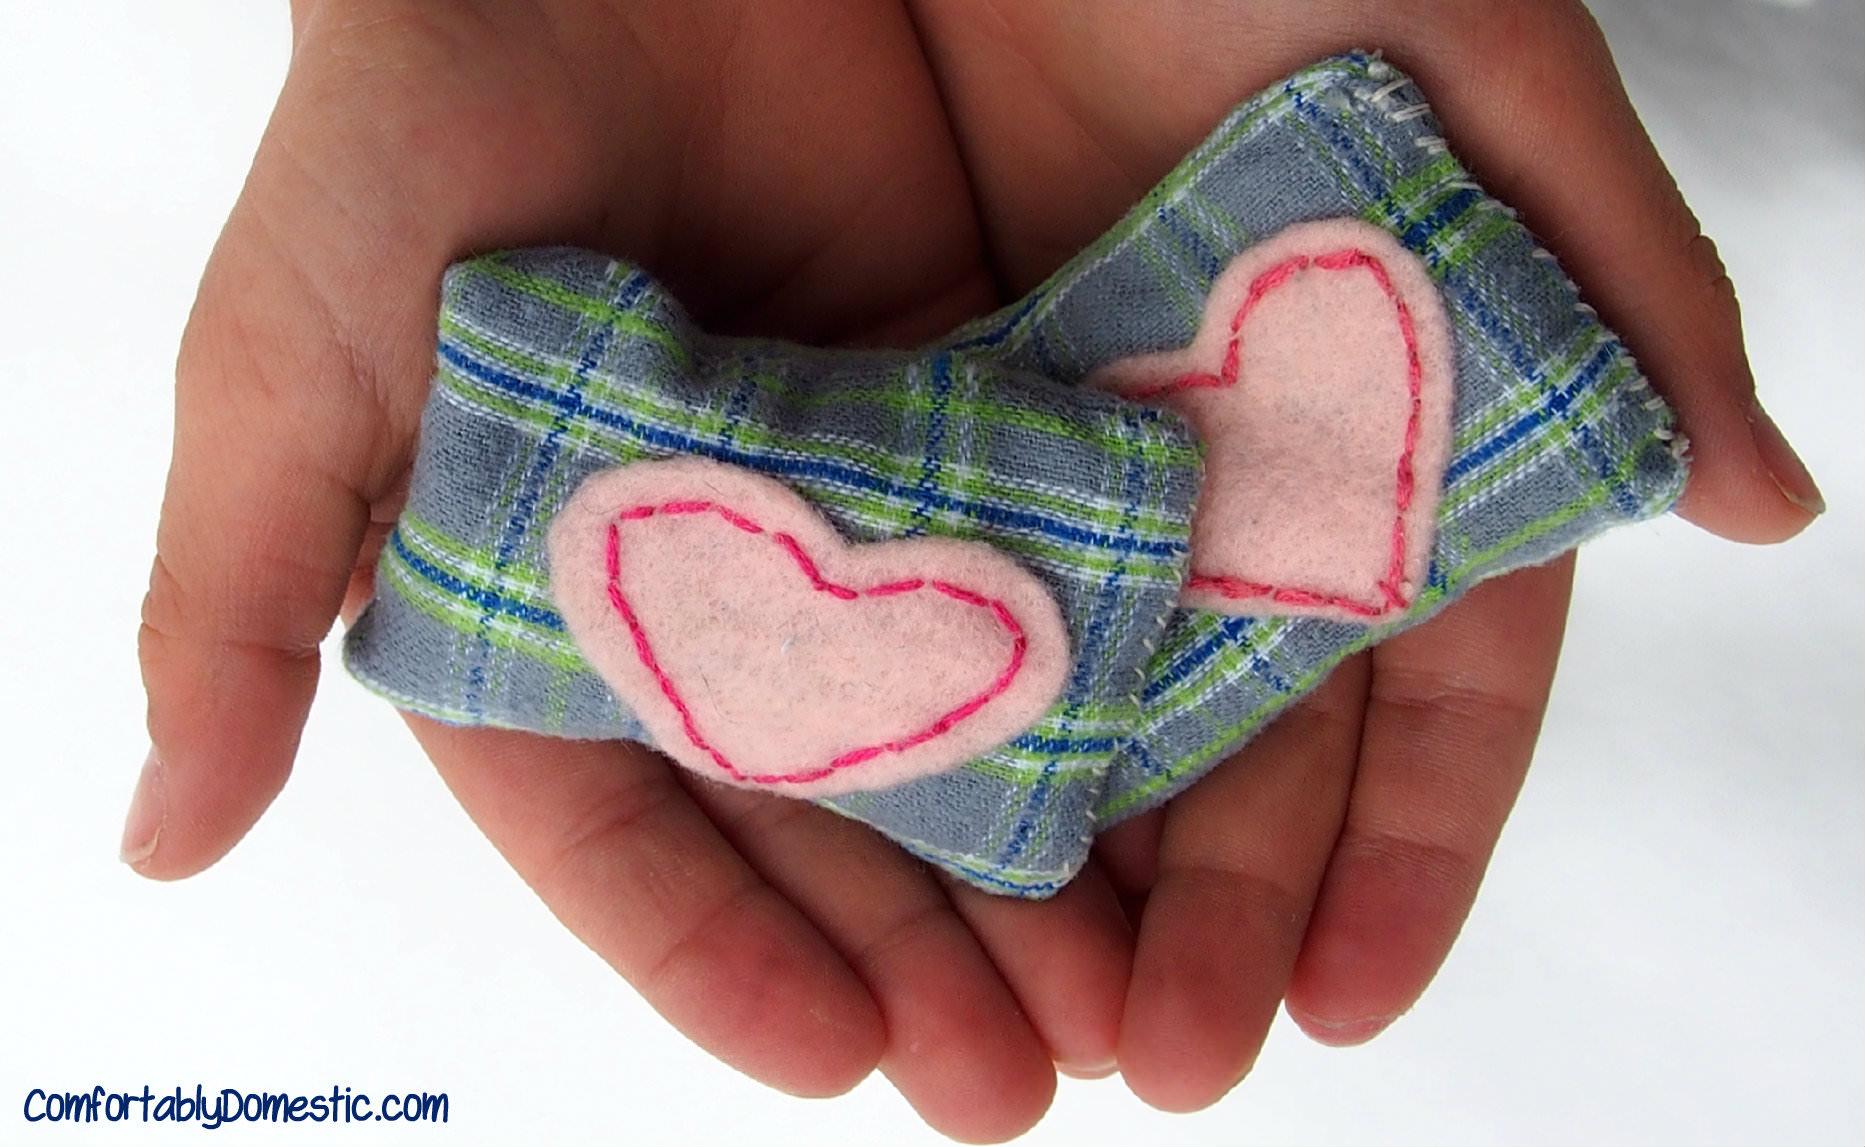 Microwavable Hand Warmers | ComfortablyDomestic.com